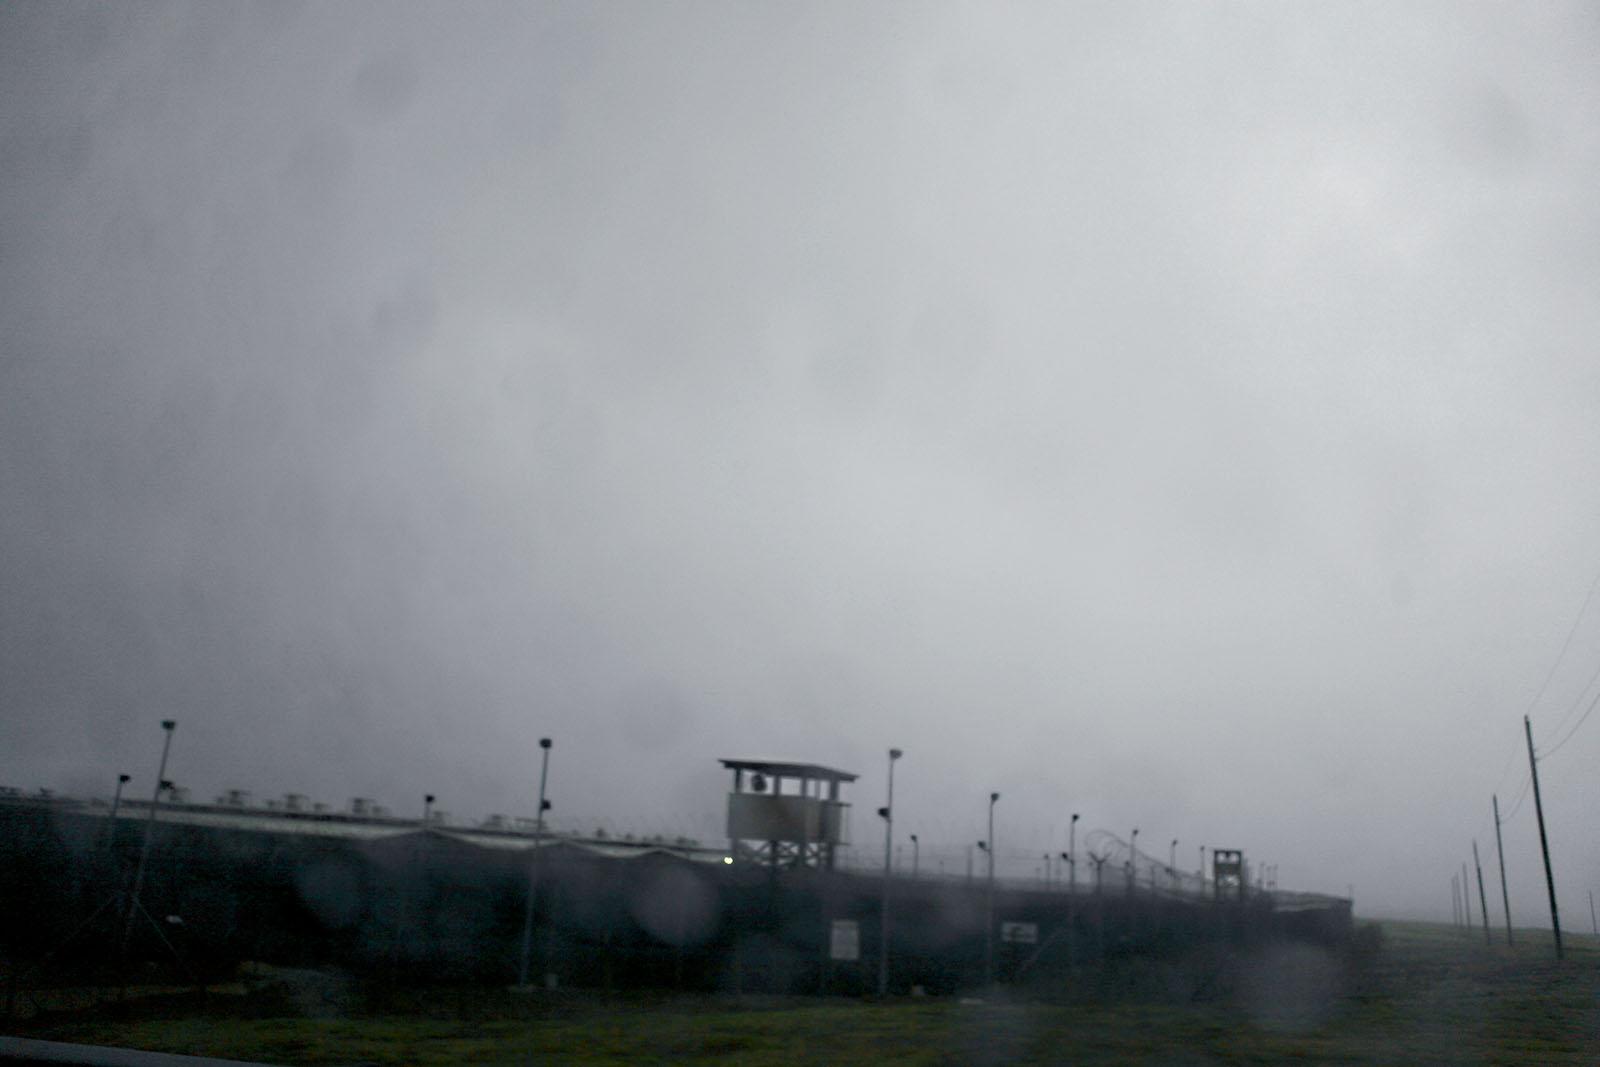 Guantanamo Bay detention camp.